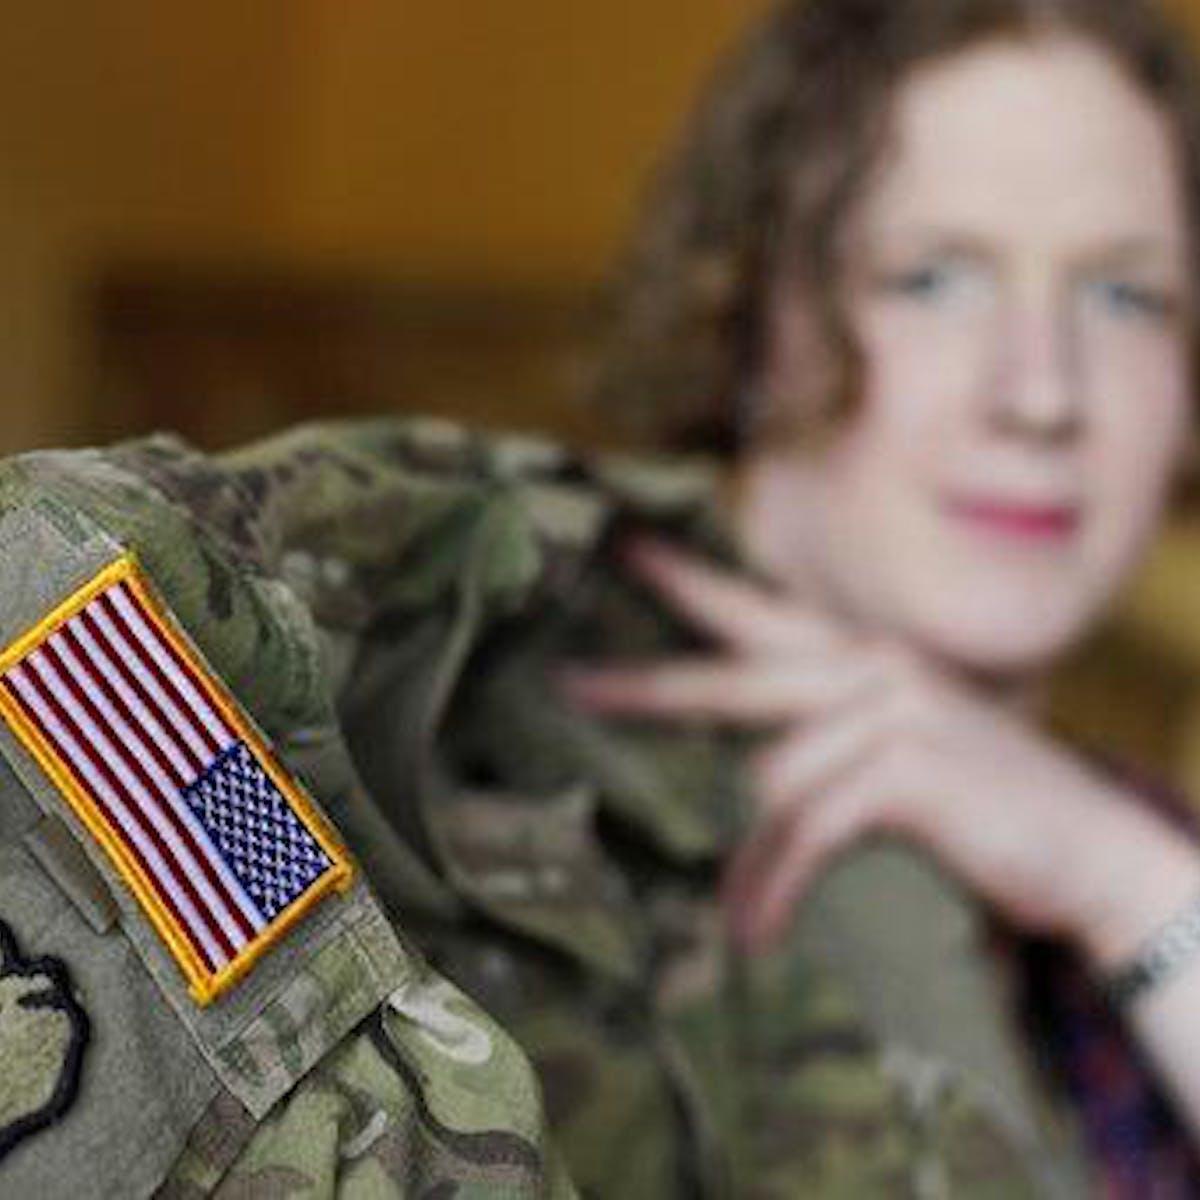 Fit to serve: Data on transgender military service